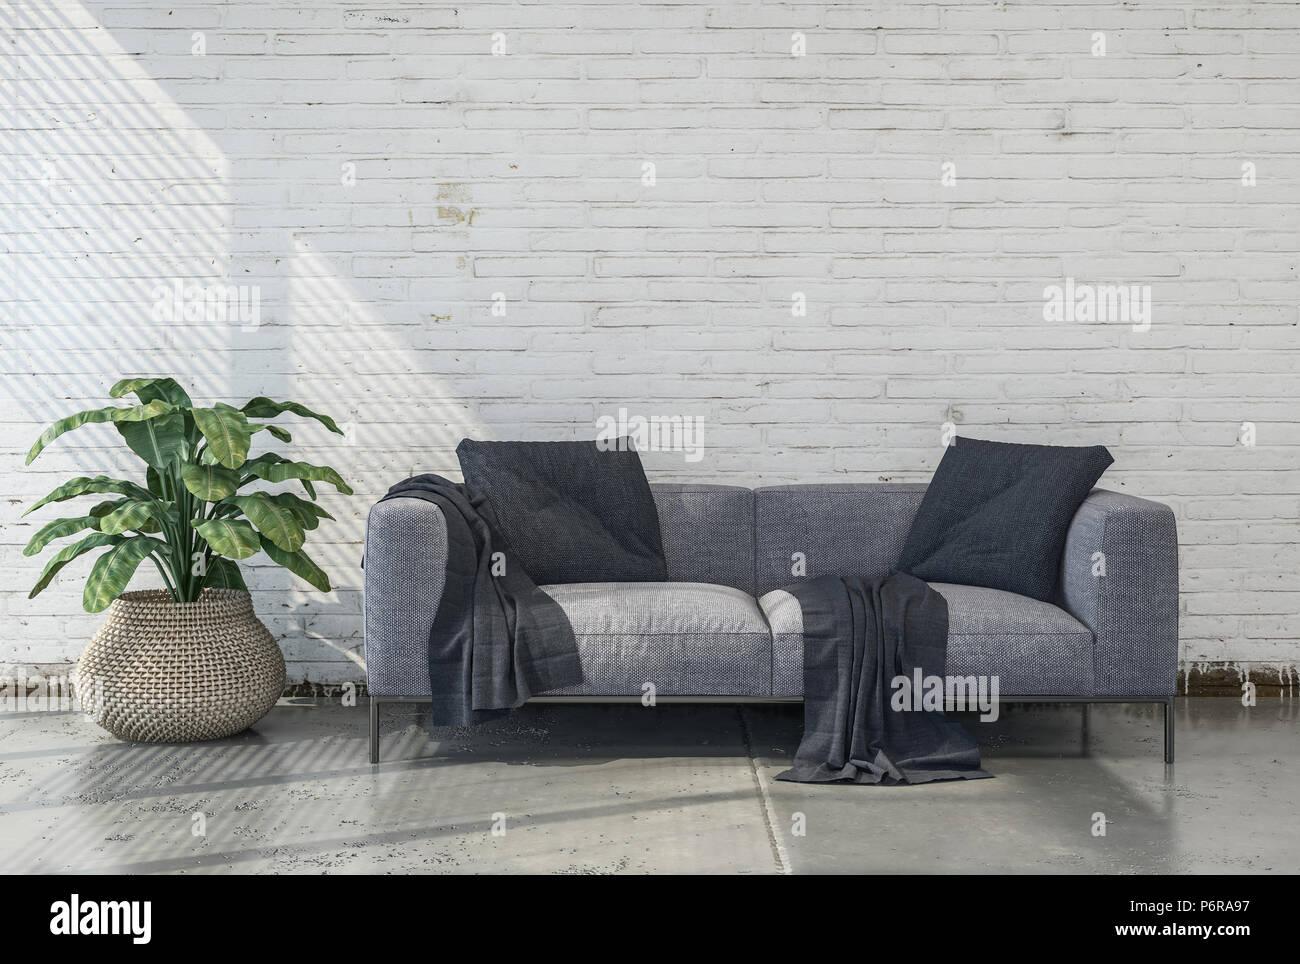 Minimalist Monochromatic Living Room Interior With Grey Sofa